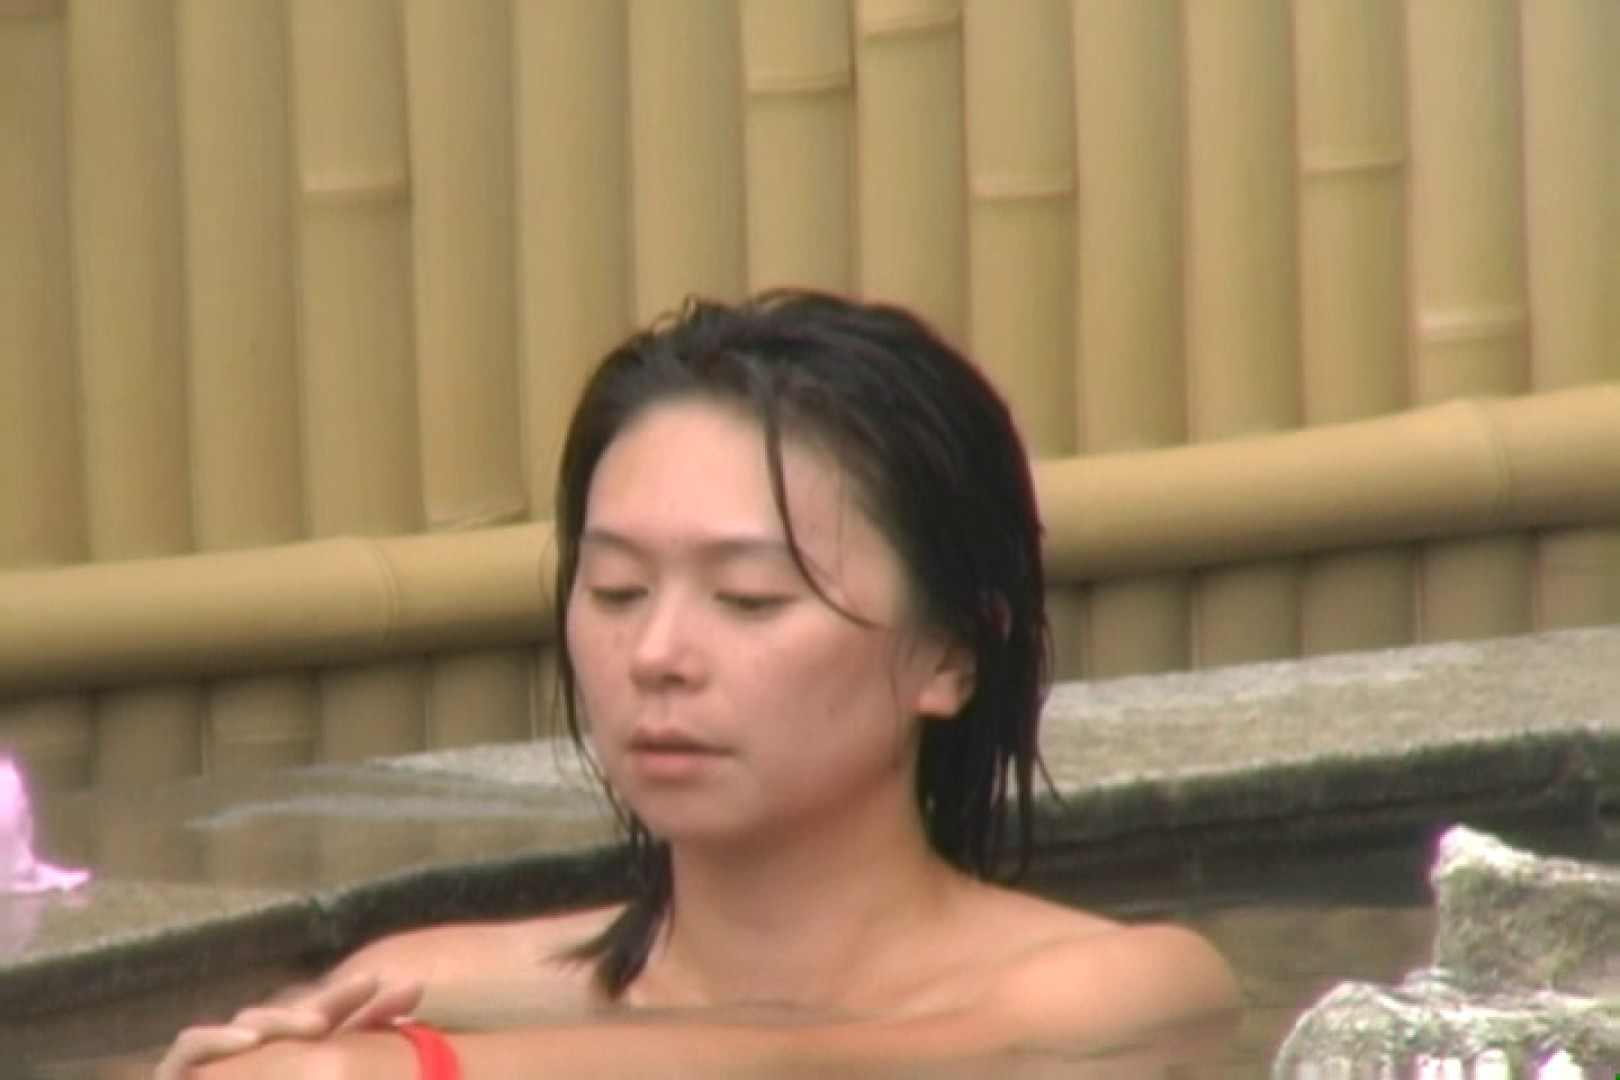 Aquaな露天風呂Vol.619 HなOL オマンコ動画キャプチャ 107pic 17